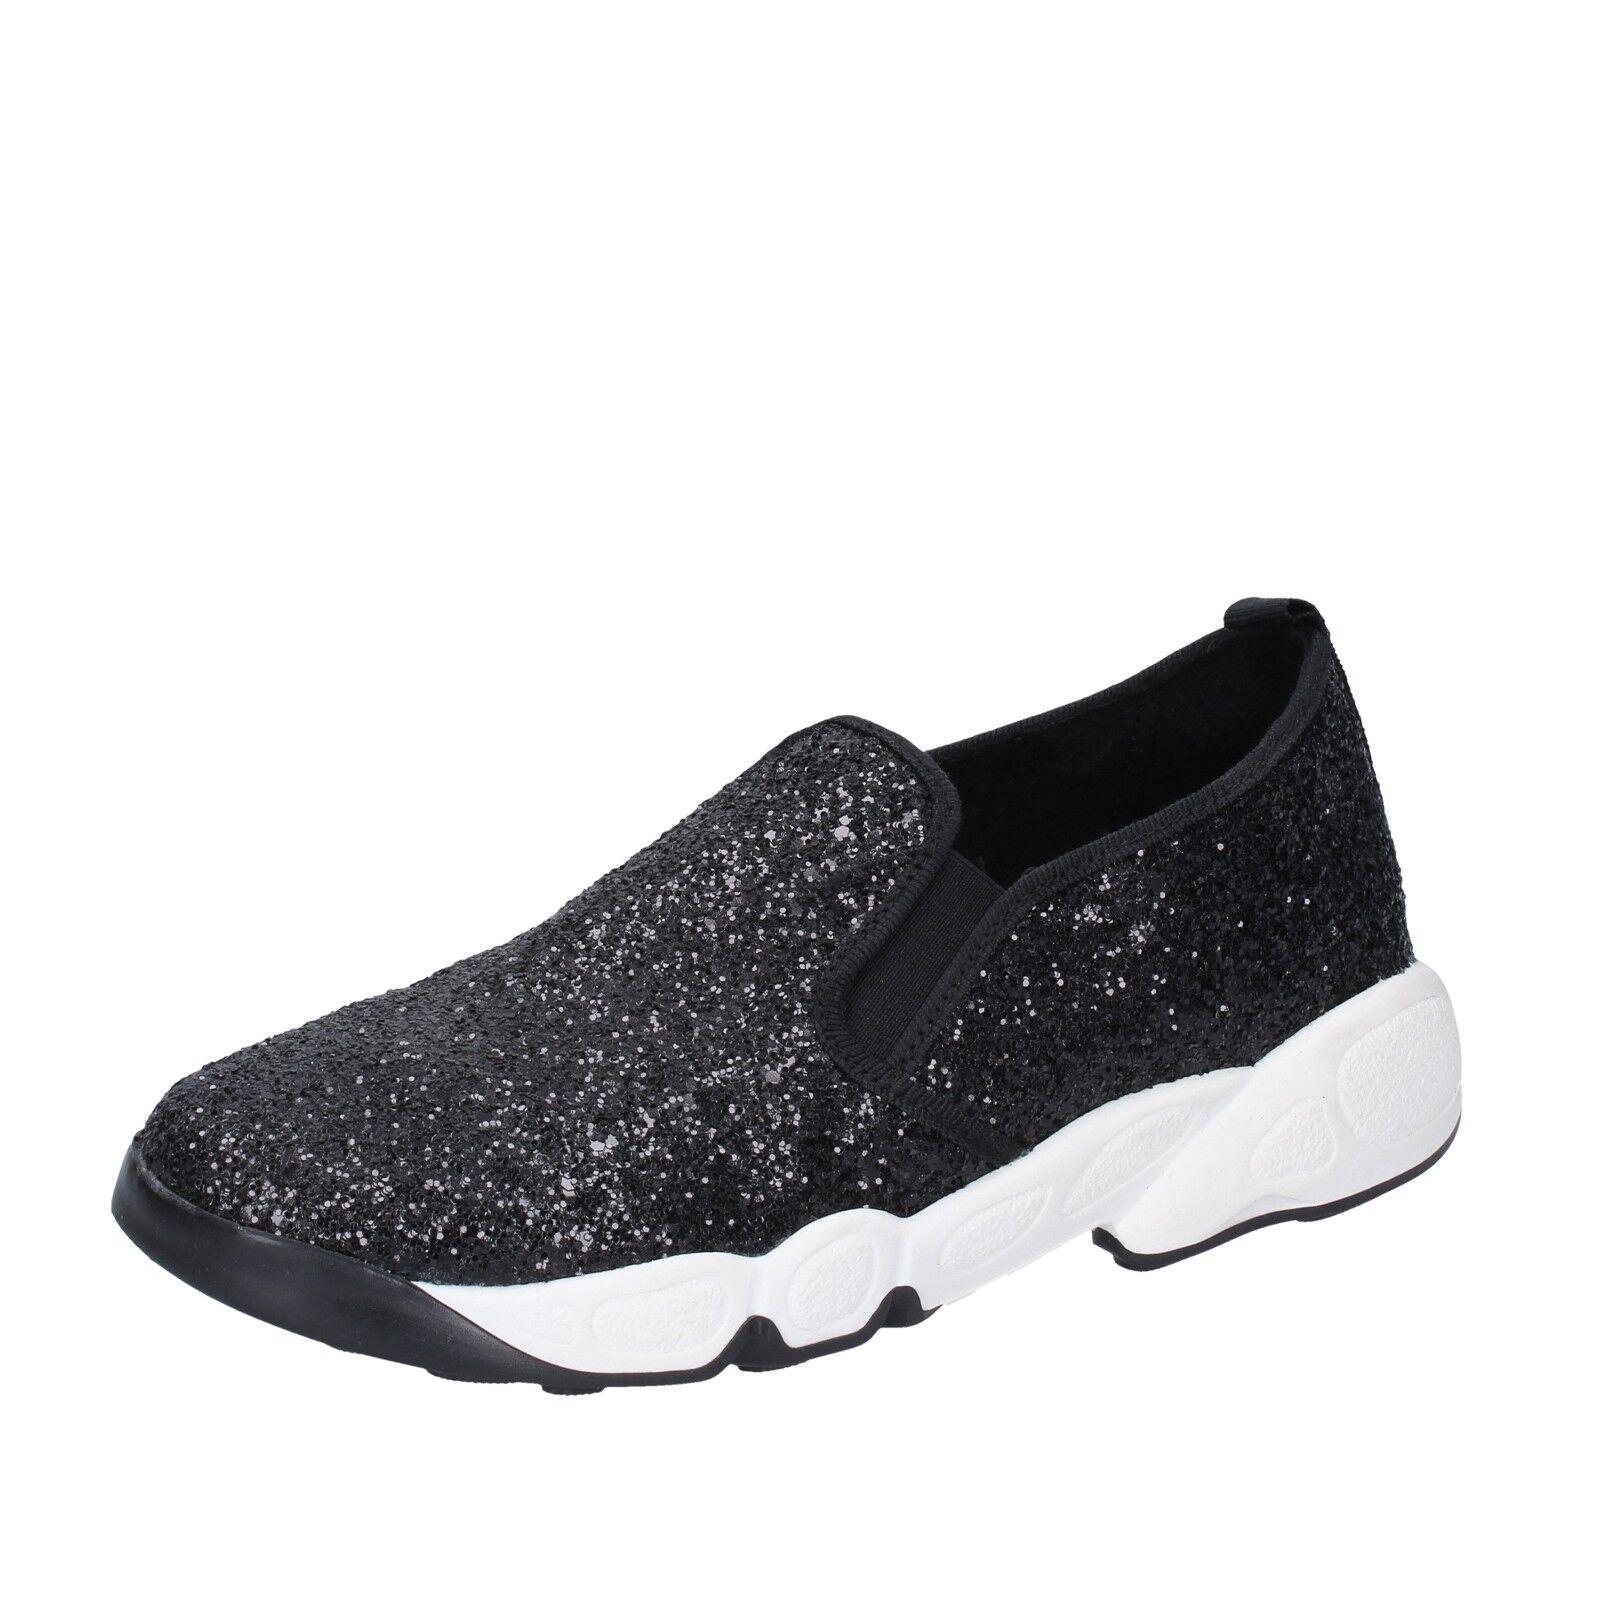 Zapatos señora olga Burini 36 UE mocasines mocasines mocasines slip on negro glitter bx789-36  Sin impuestos